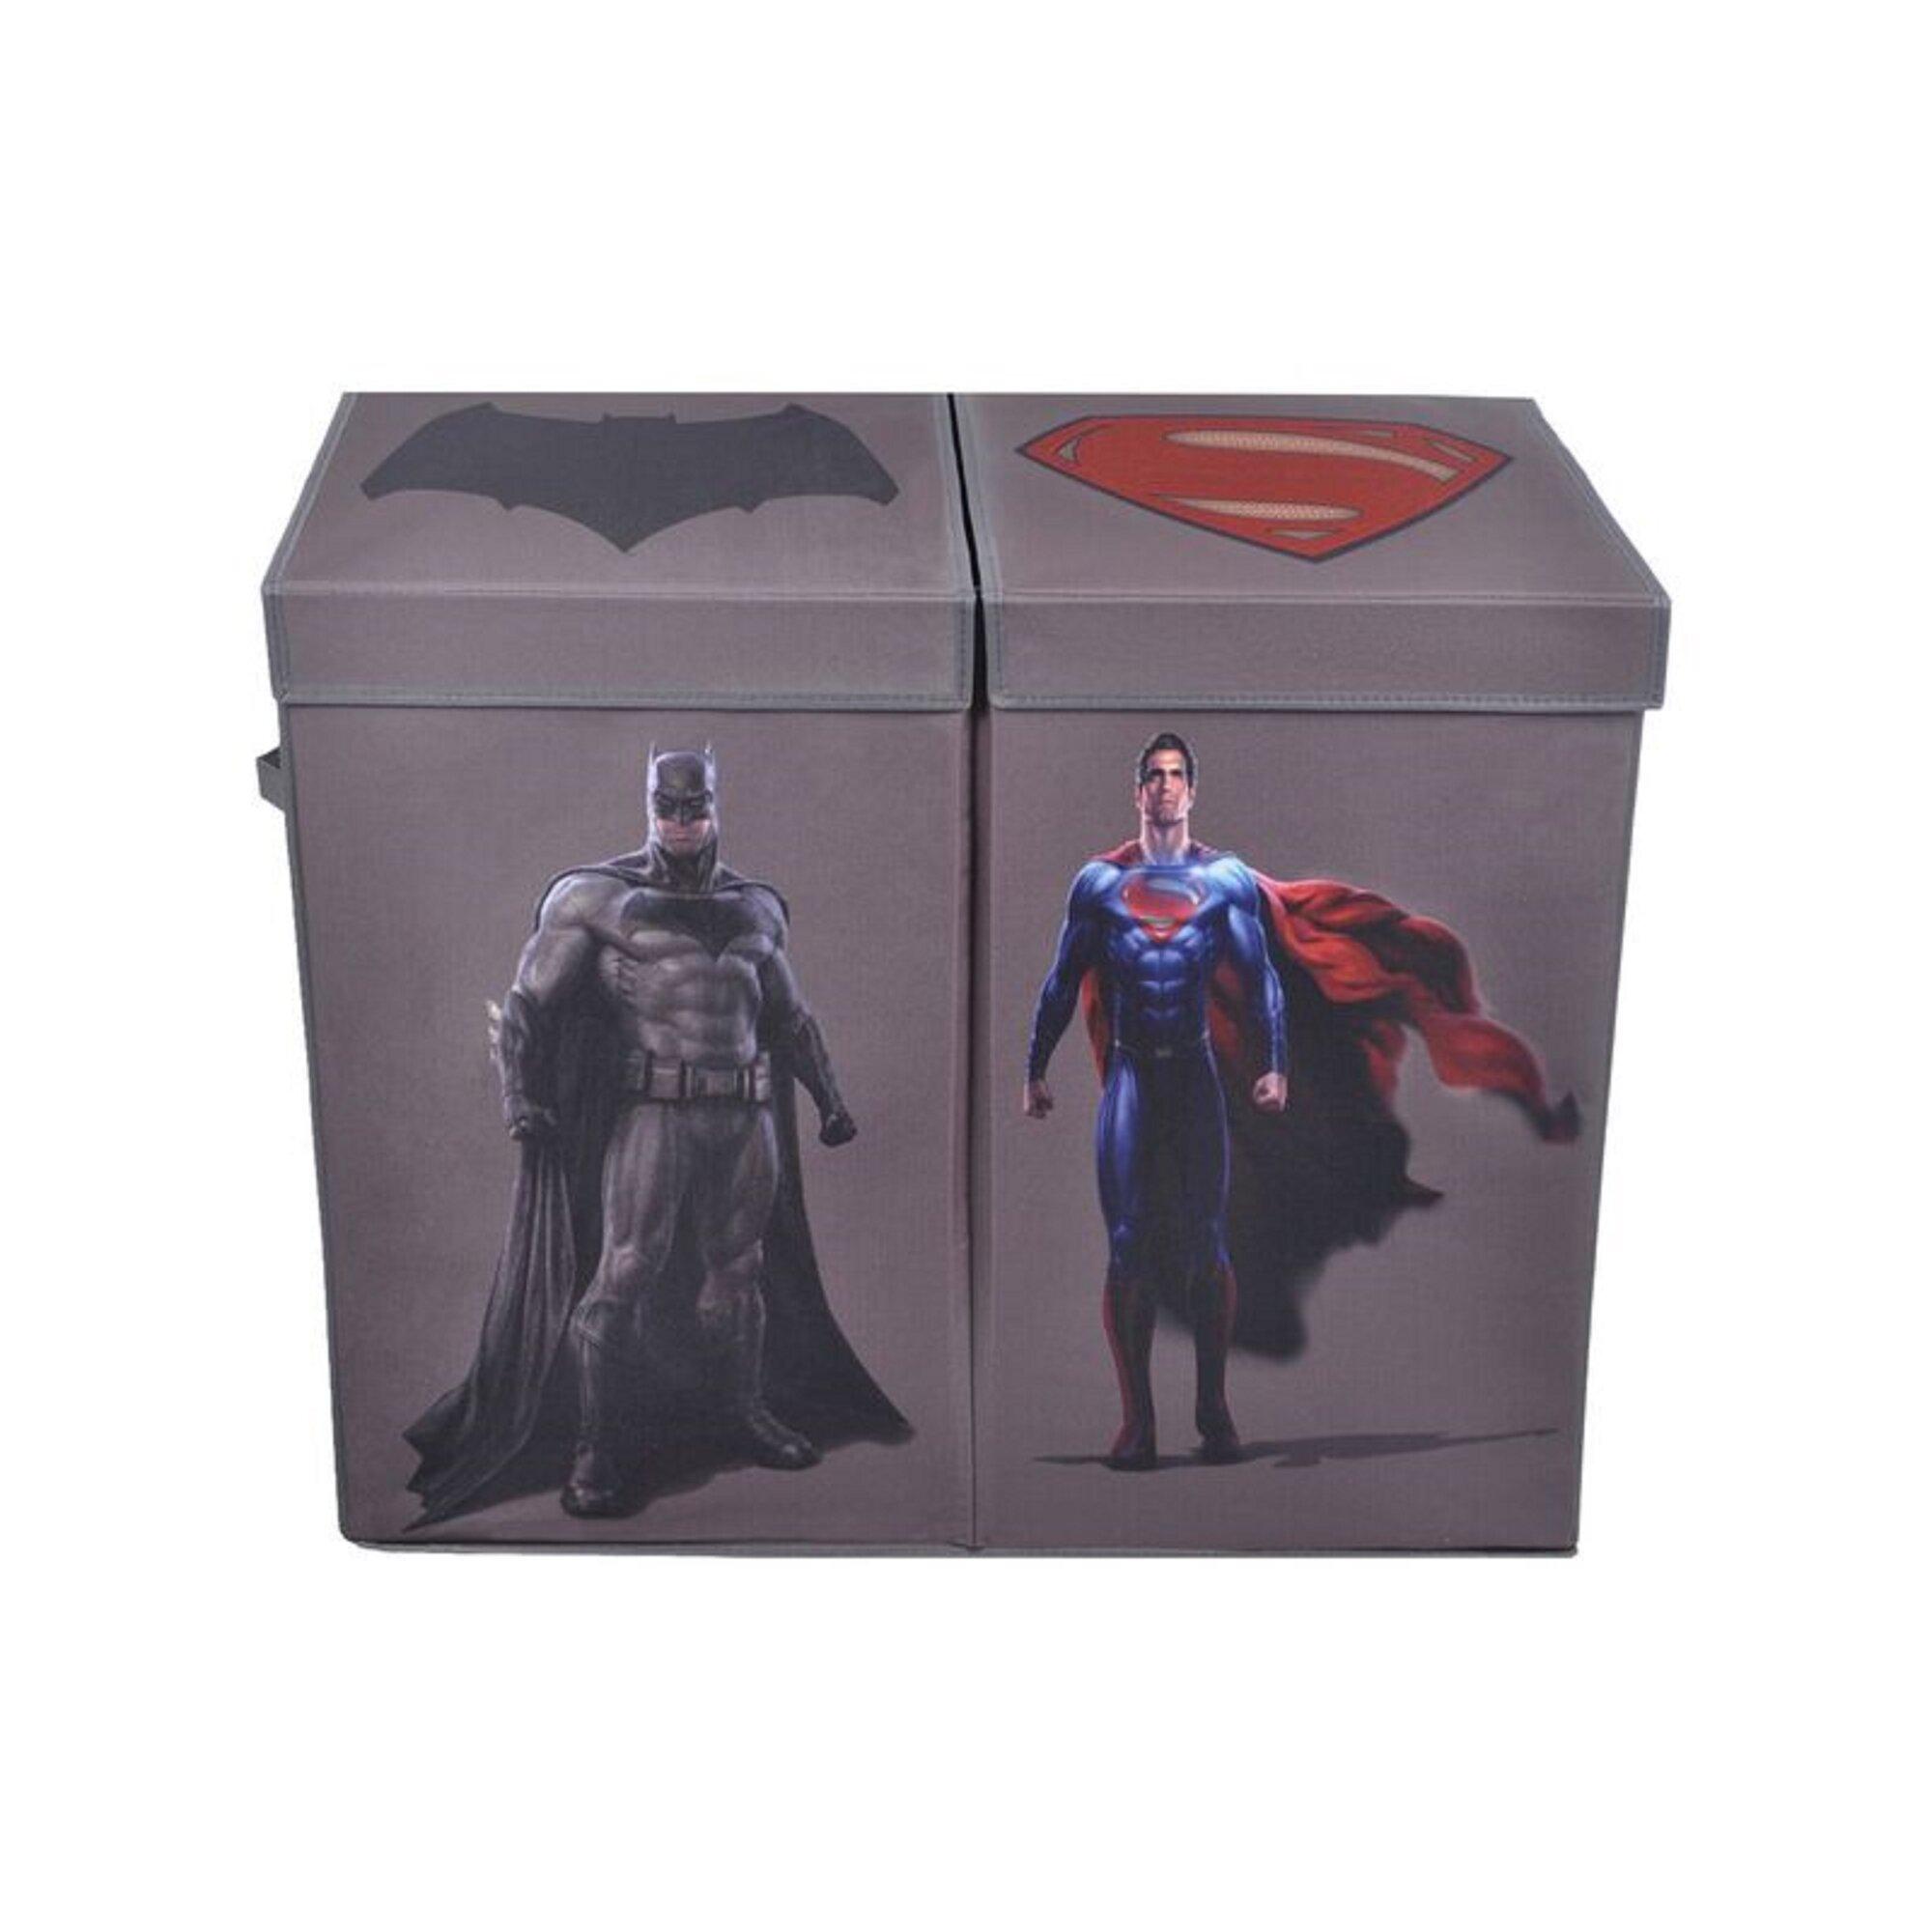 Modern littles batman vs superman character folding double laundry sorter reviews wayfair - Batman laundry hamper ...